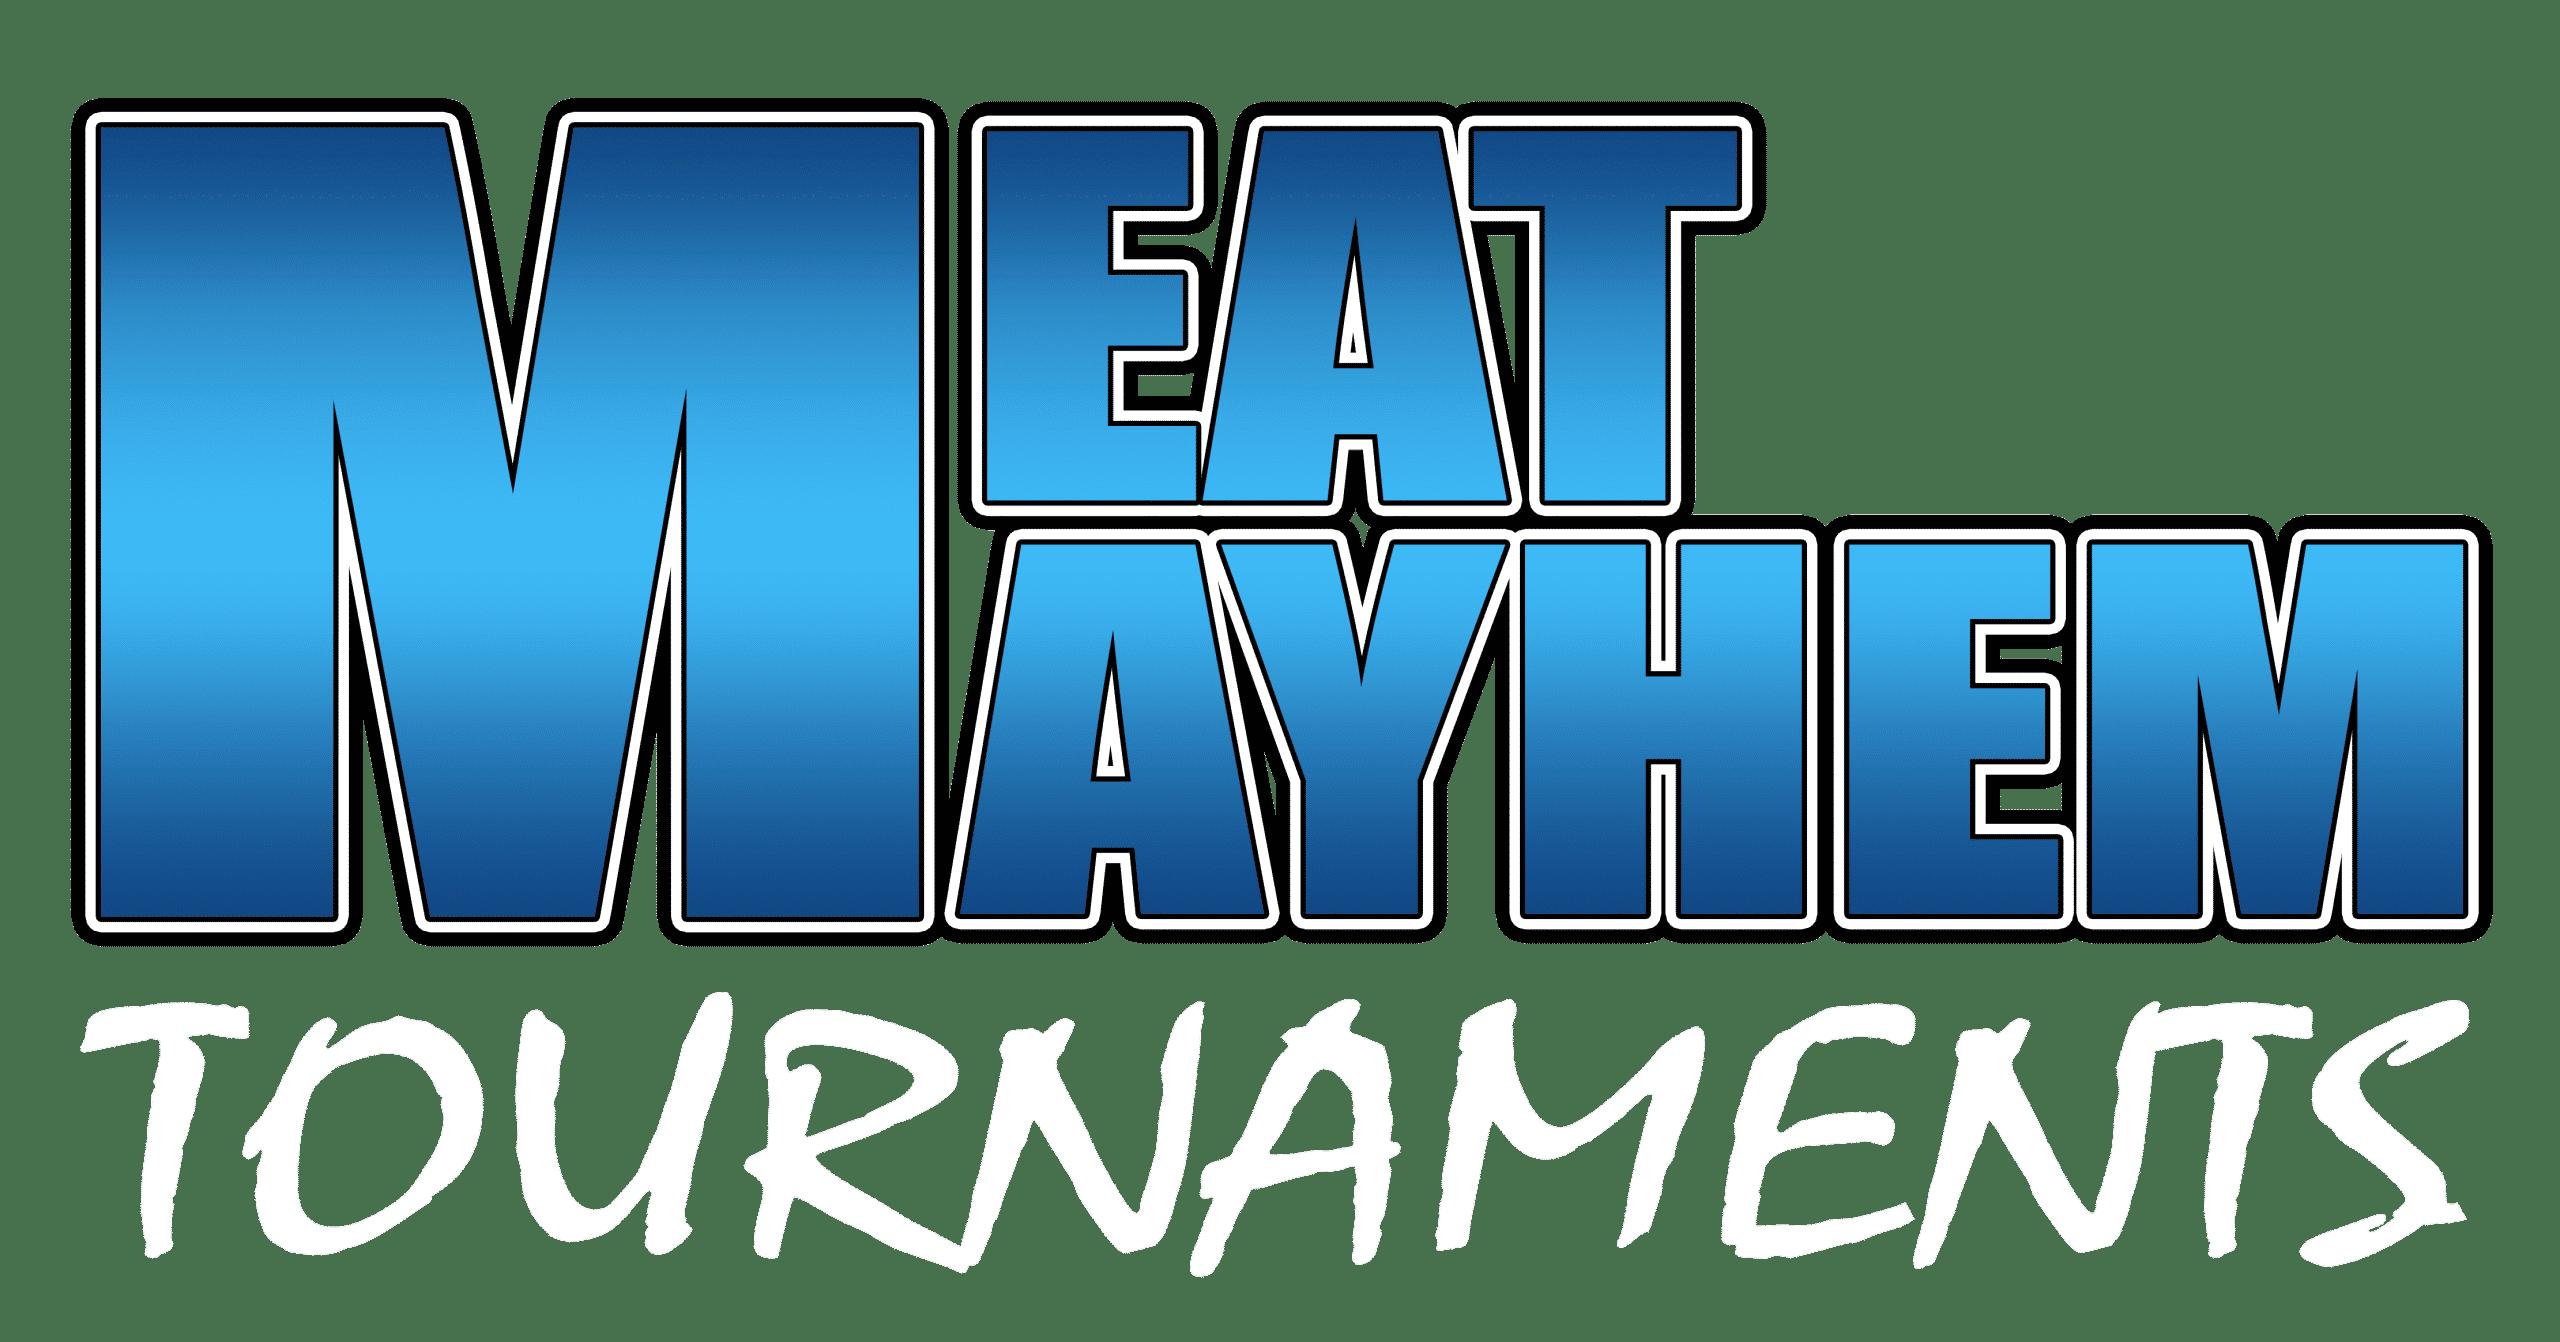 Clearwater Beach Kingfish Mayhem | Clearwater Beach Kingfish Mayhem | Meat Mayhem